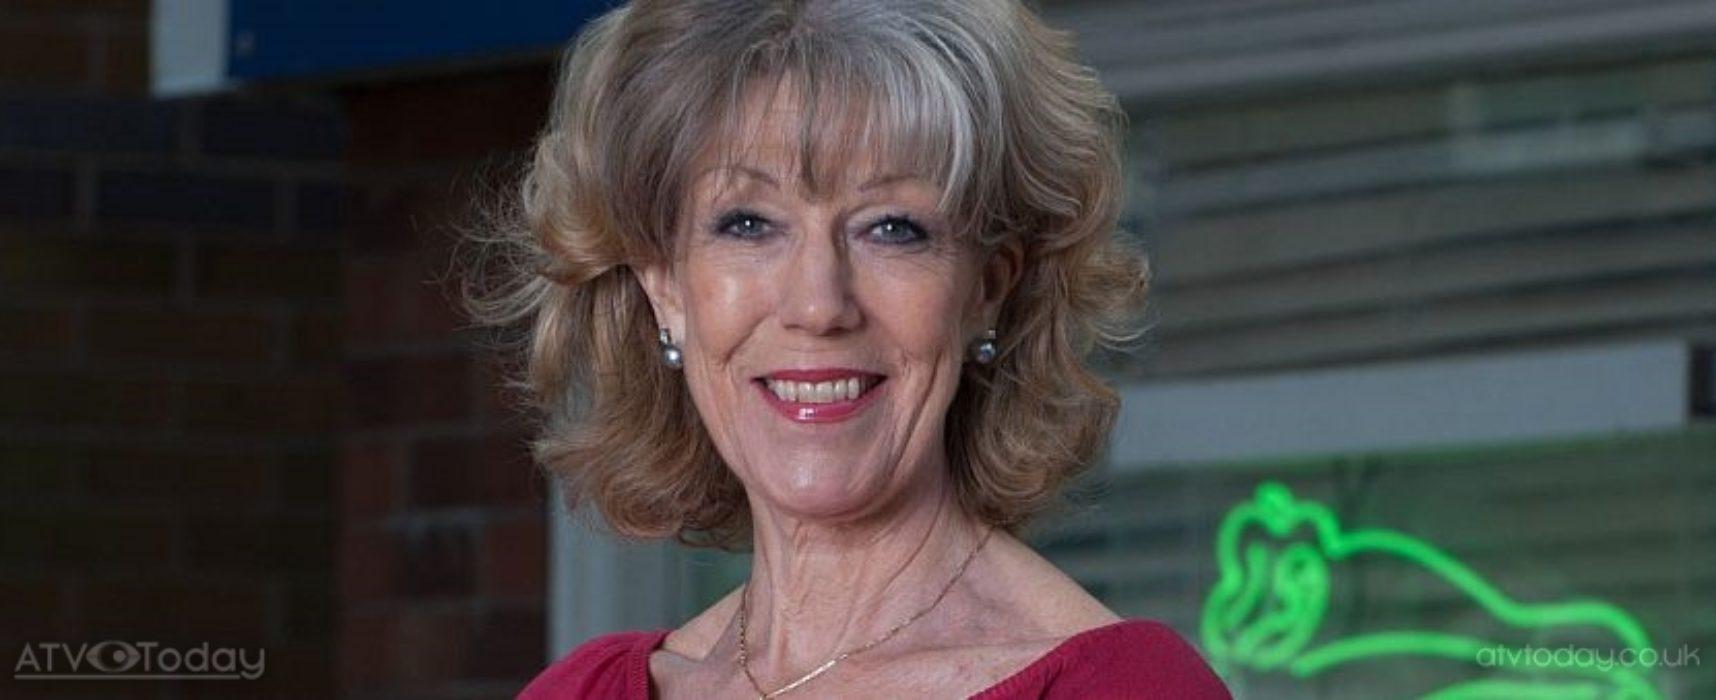 ITV celebrate Corrie star Sue Nicholls